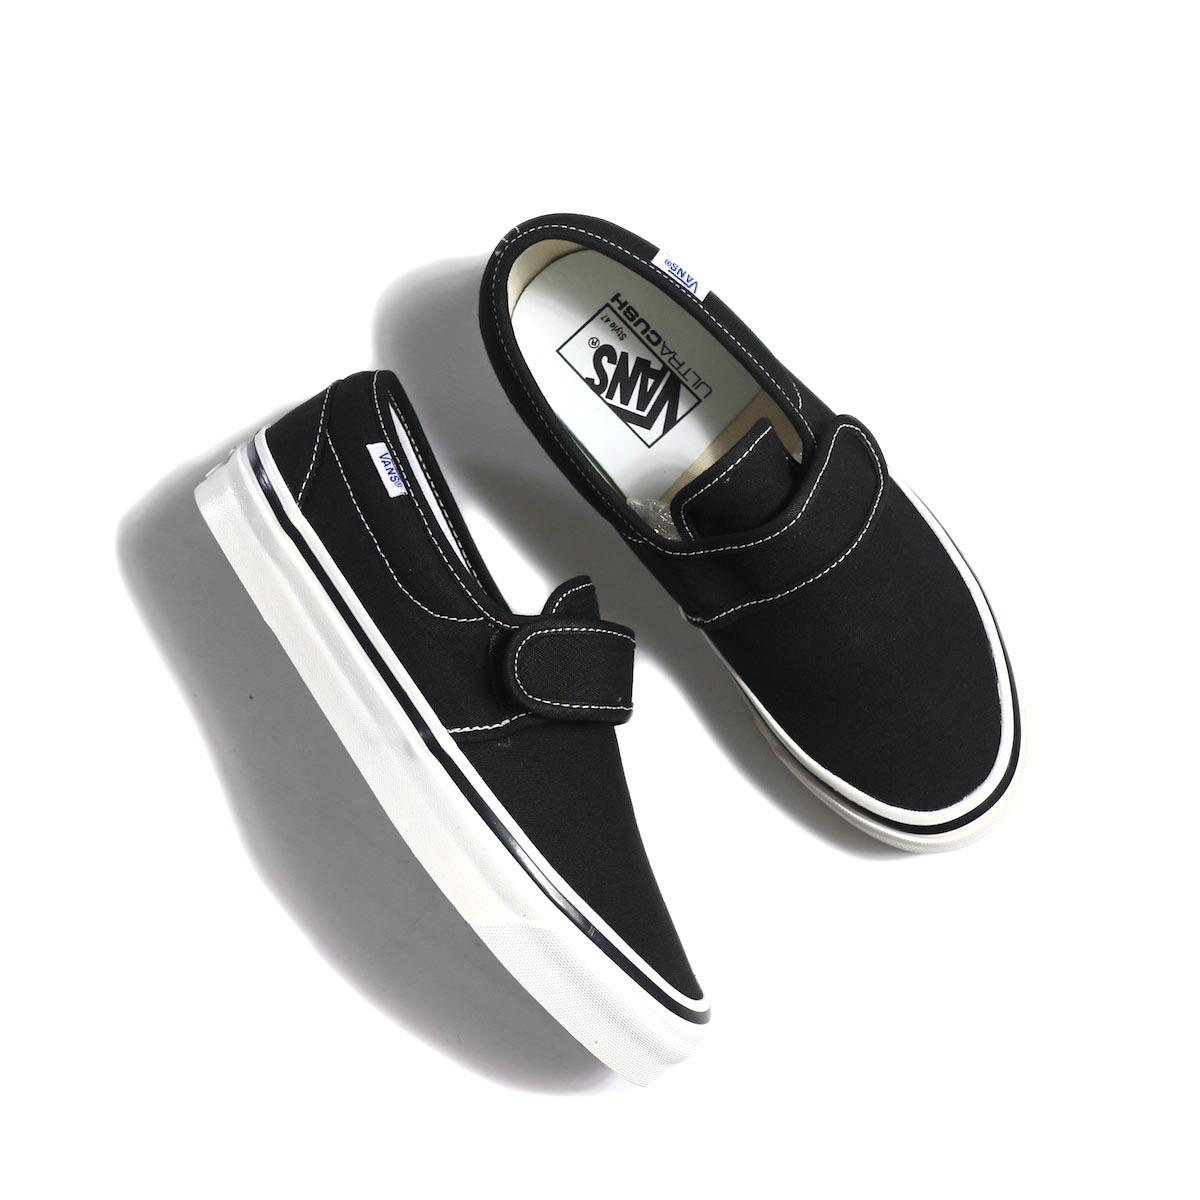 VANS / Slip-On 47 V DX (Anaheim Factory) -Black